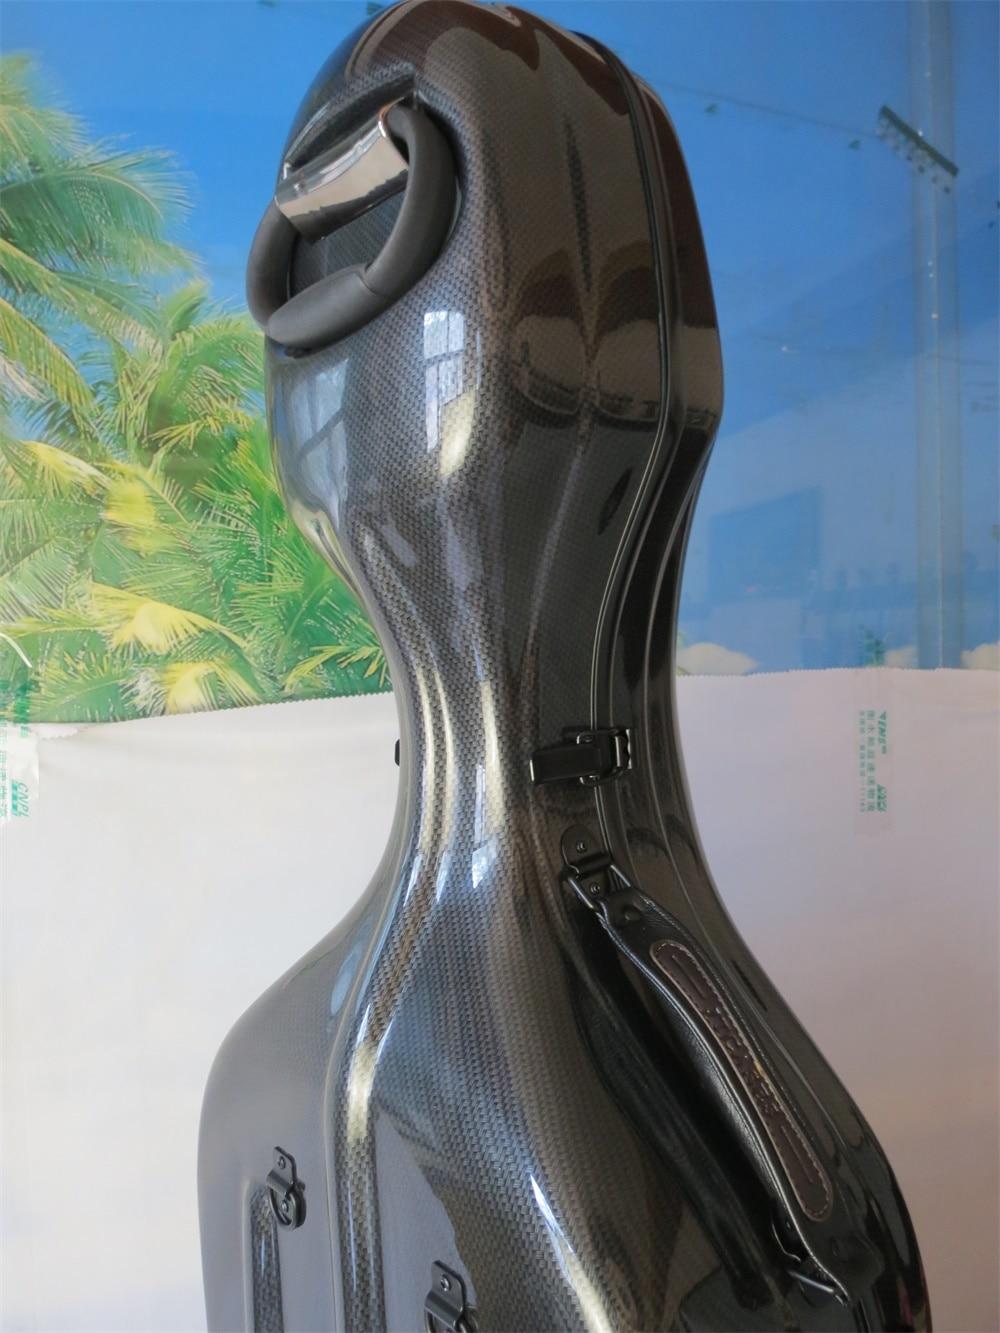 composite carbon fiber cello case 3 cello case in cello from sports entertainment on. Black Bedroom Furniture Sets. Home Design Ideas